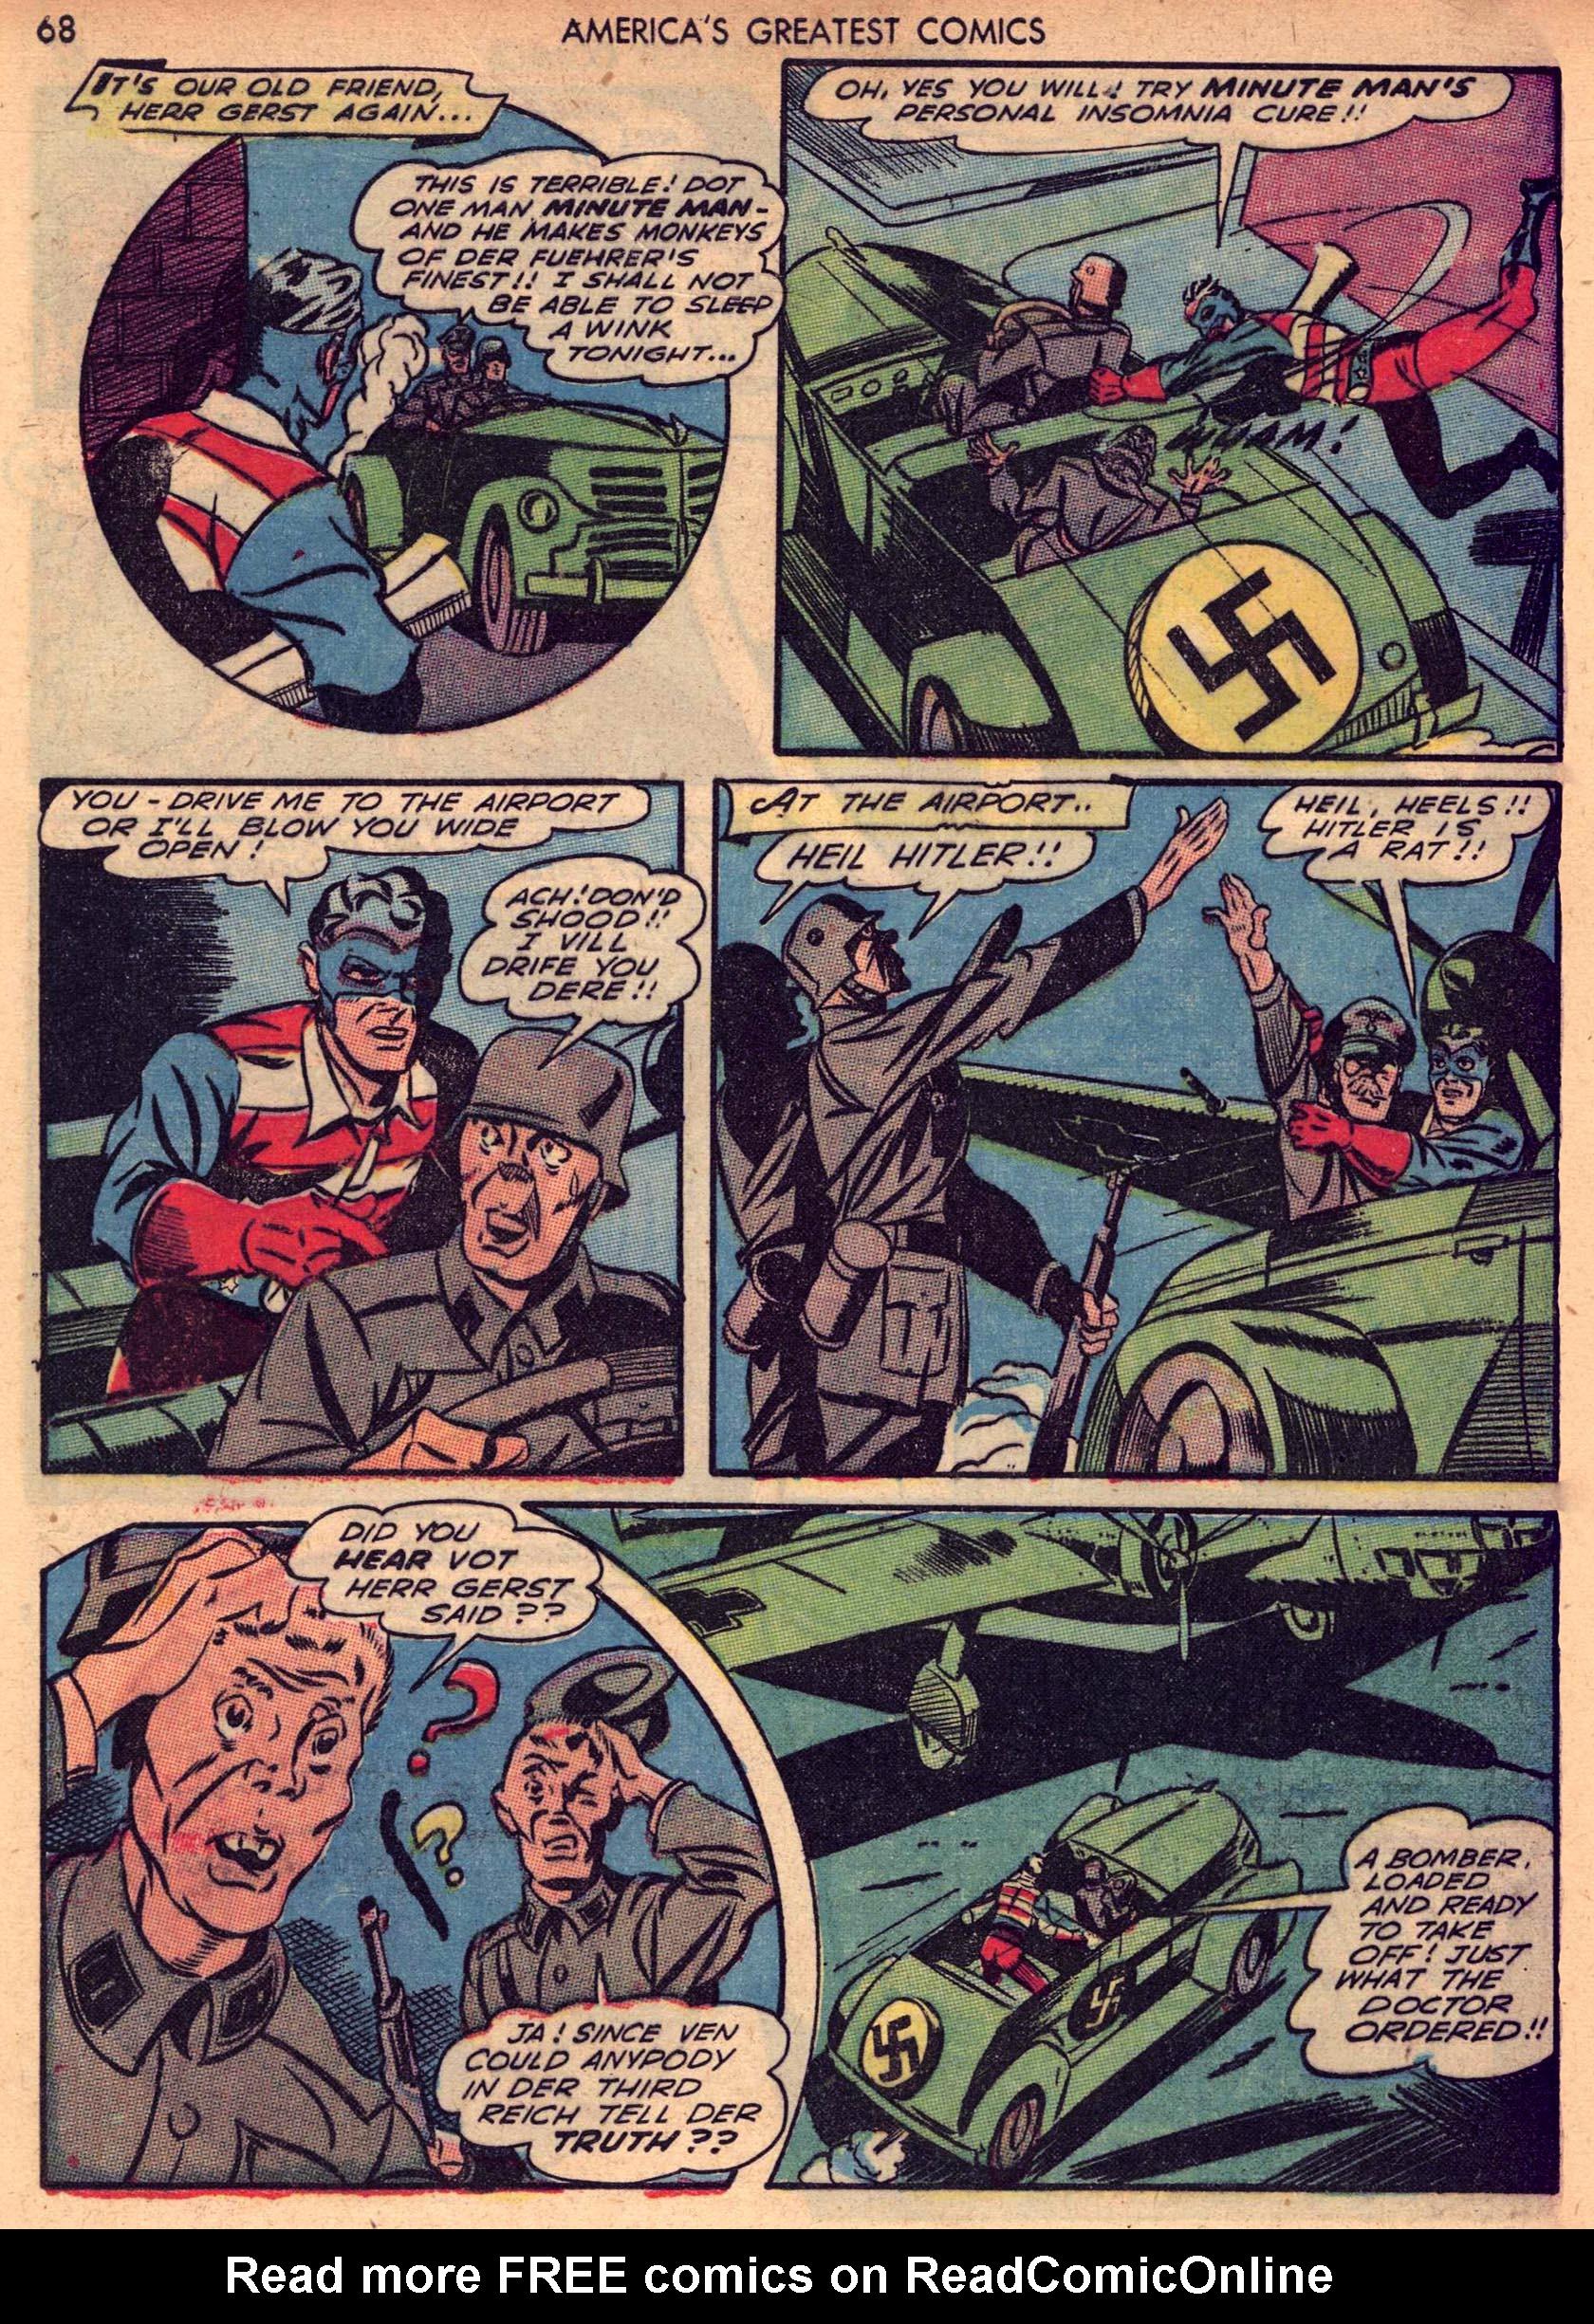 Read online America's Greatest Comics comic -  Issue #7 - 67